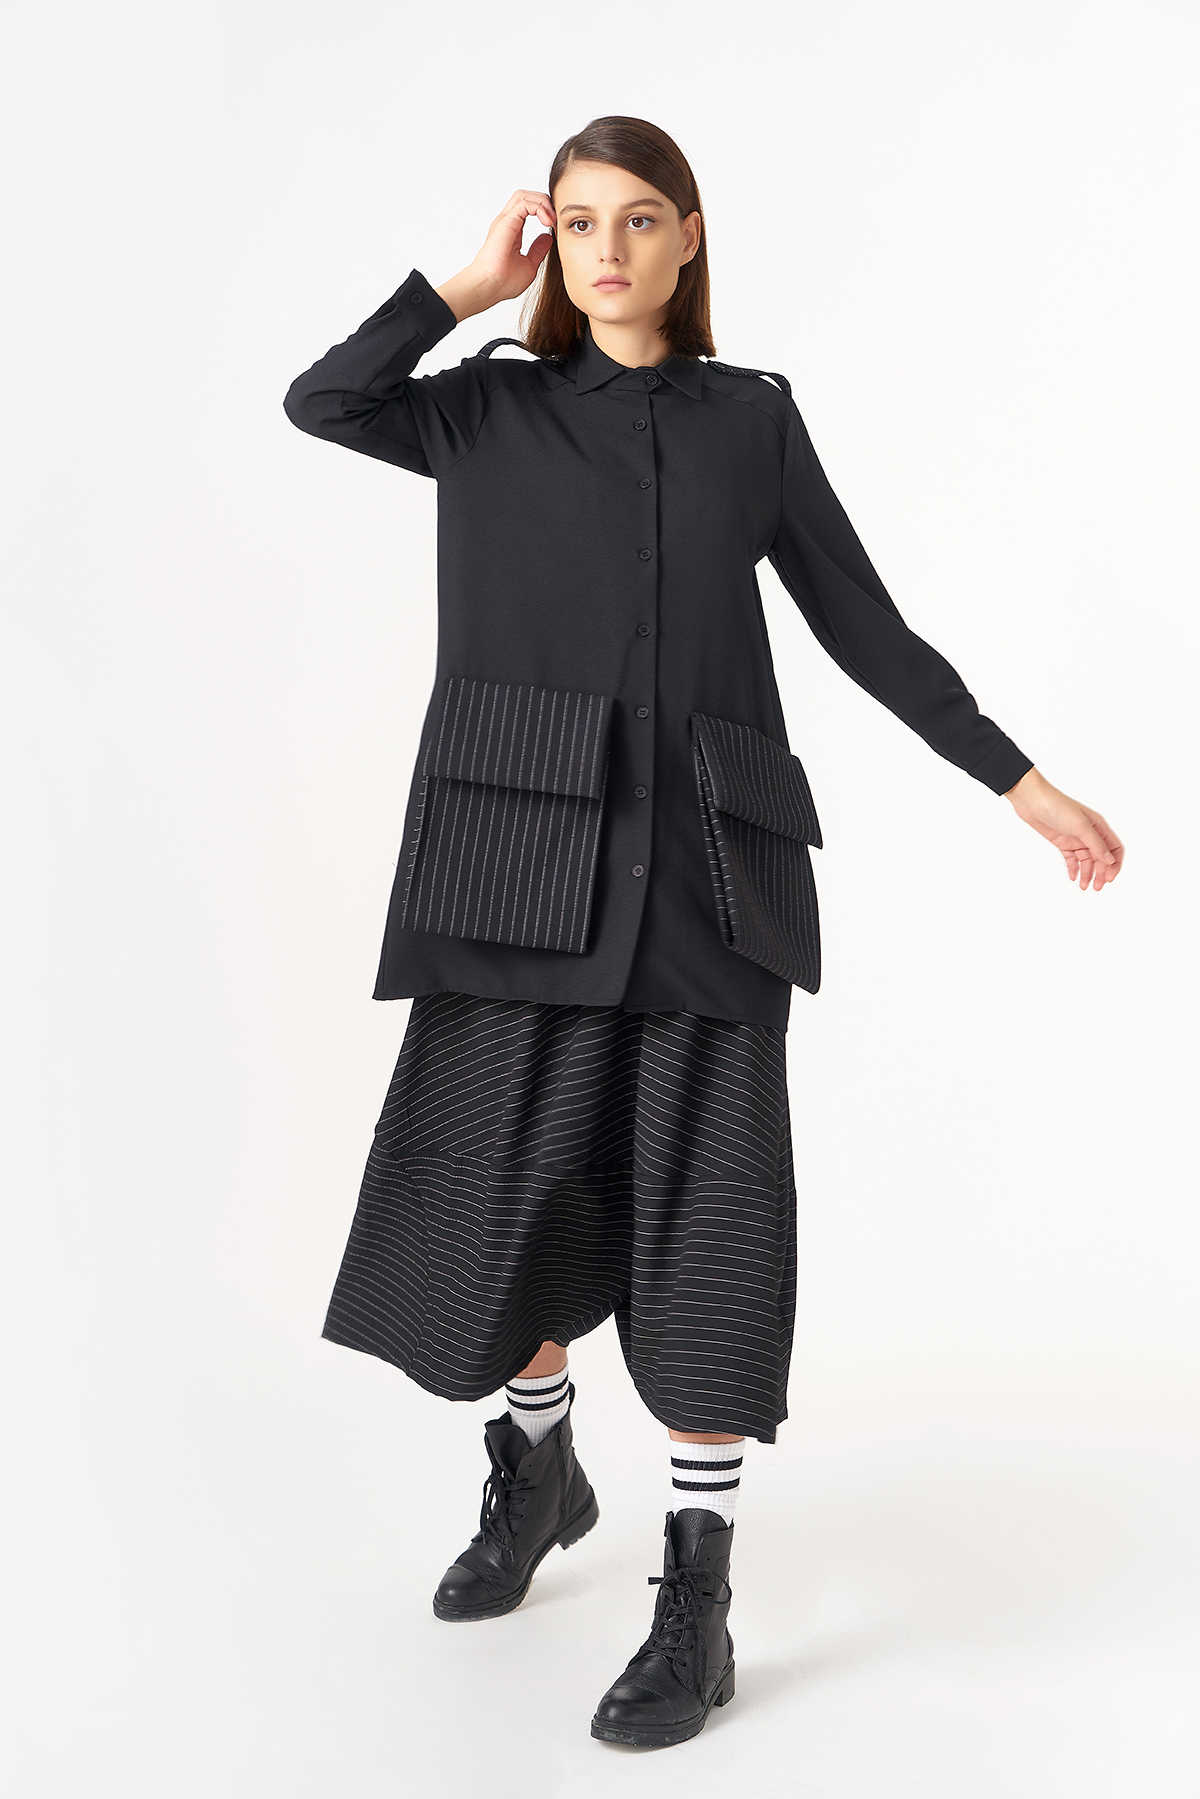 Kuaybe Gider - 5119 Tunik Siyah